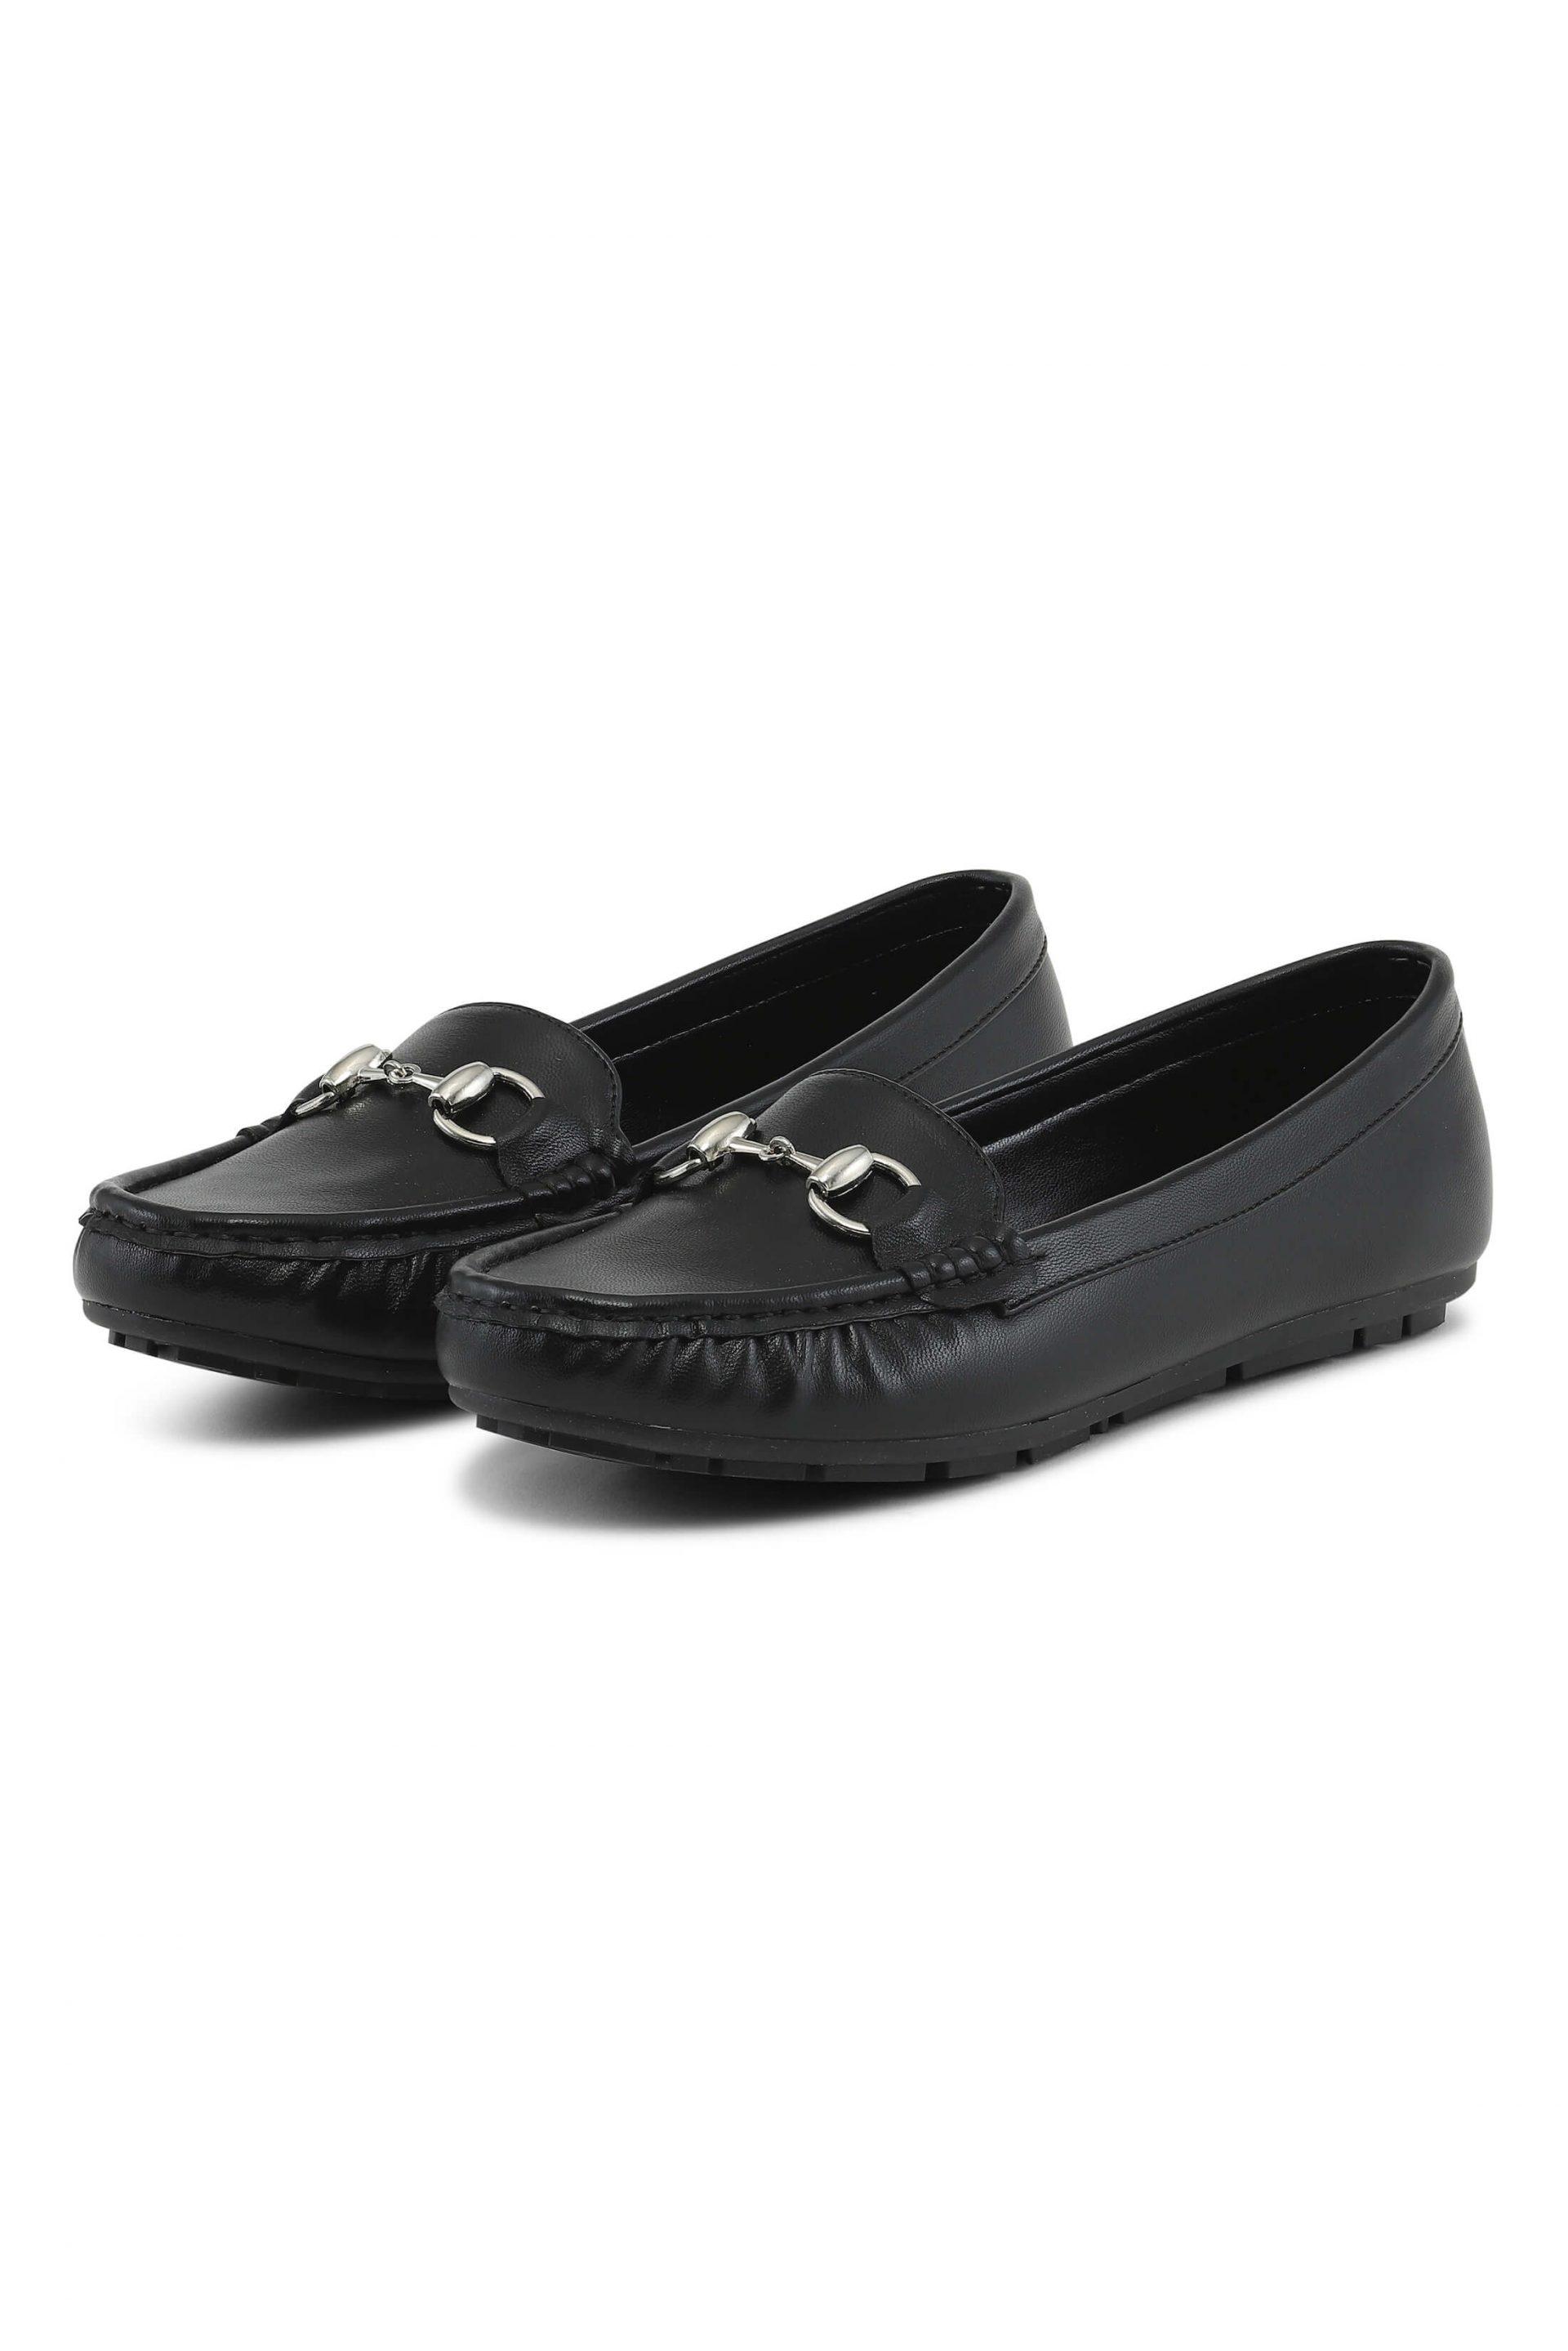 Soft black loafers